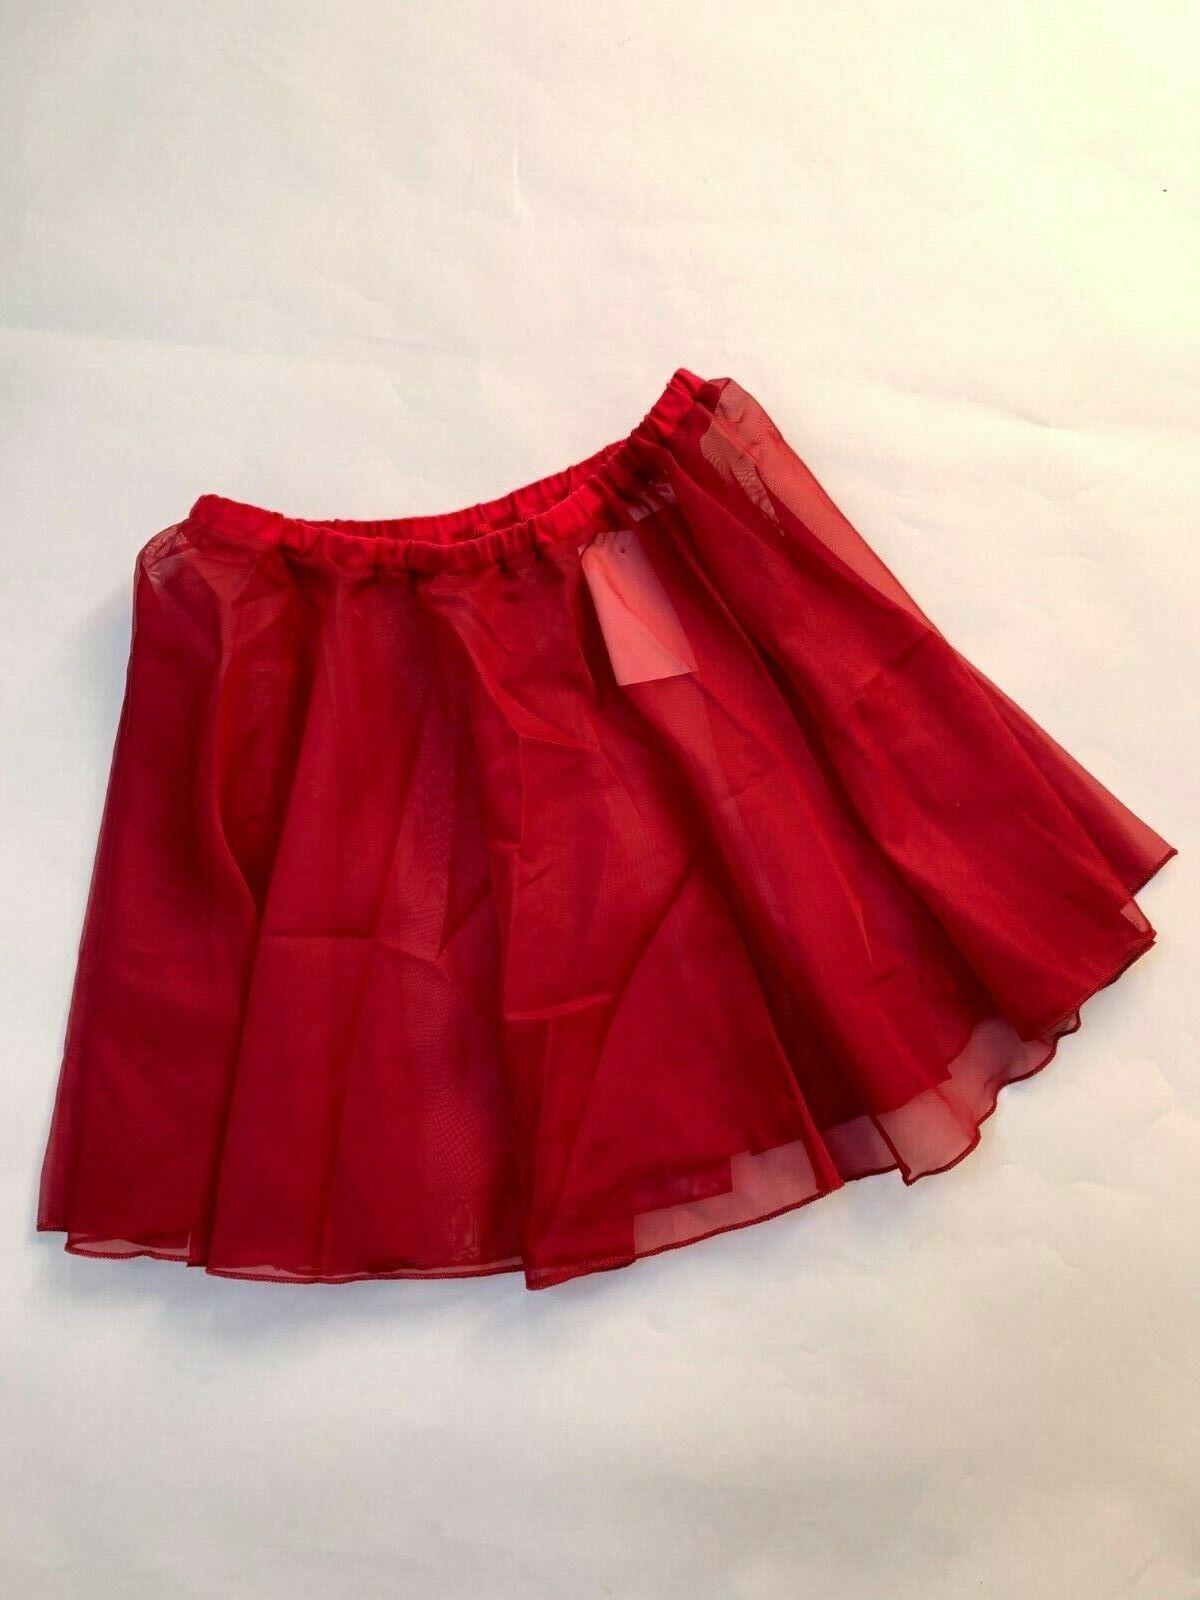 Roch Valley Plum Dancewear, Voile ballet skirt